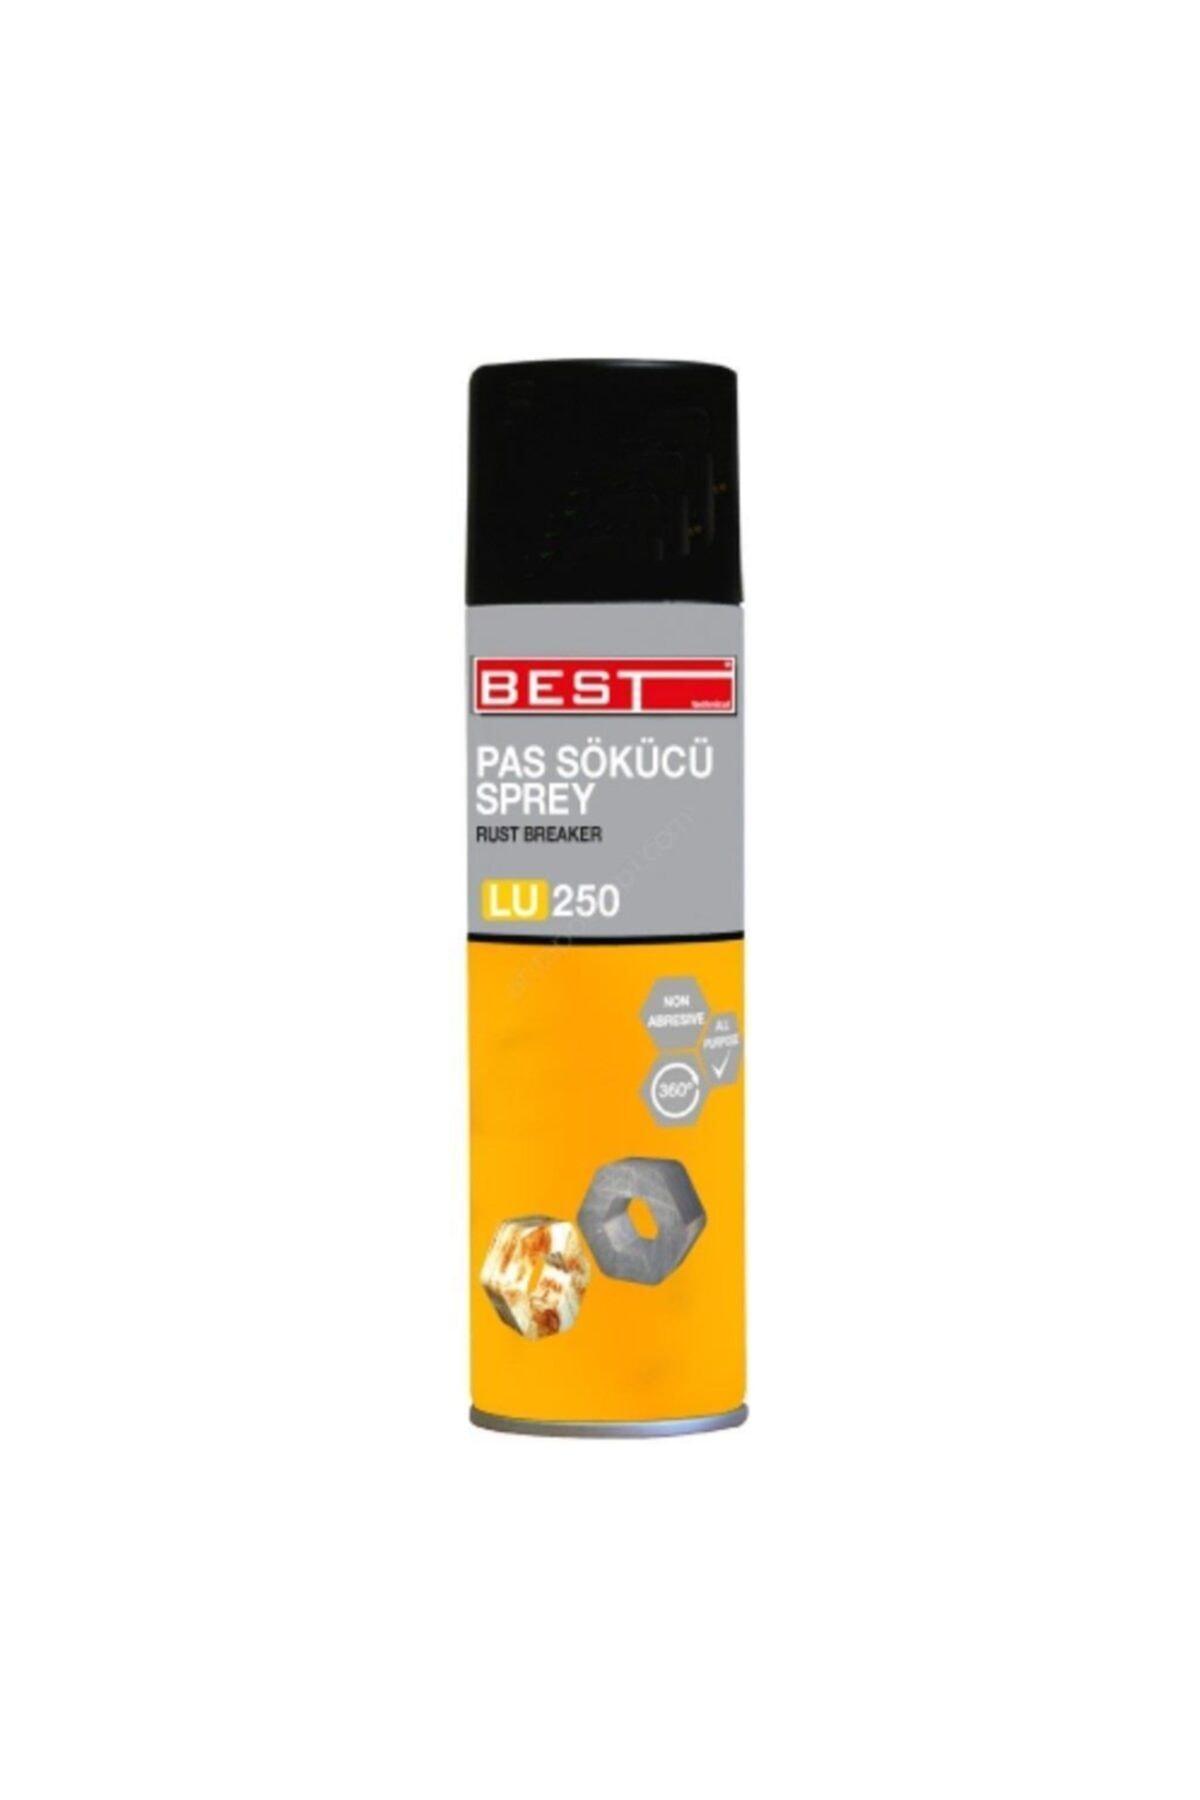 Best Pas Sökücü Sprey Lu 250 200 ml 1